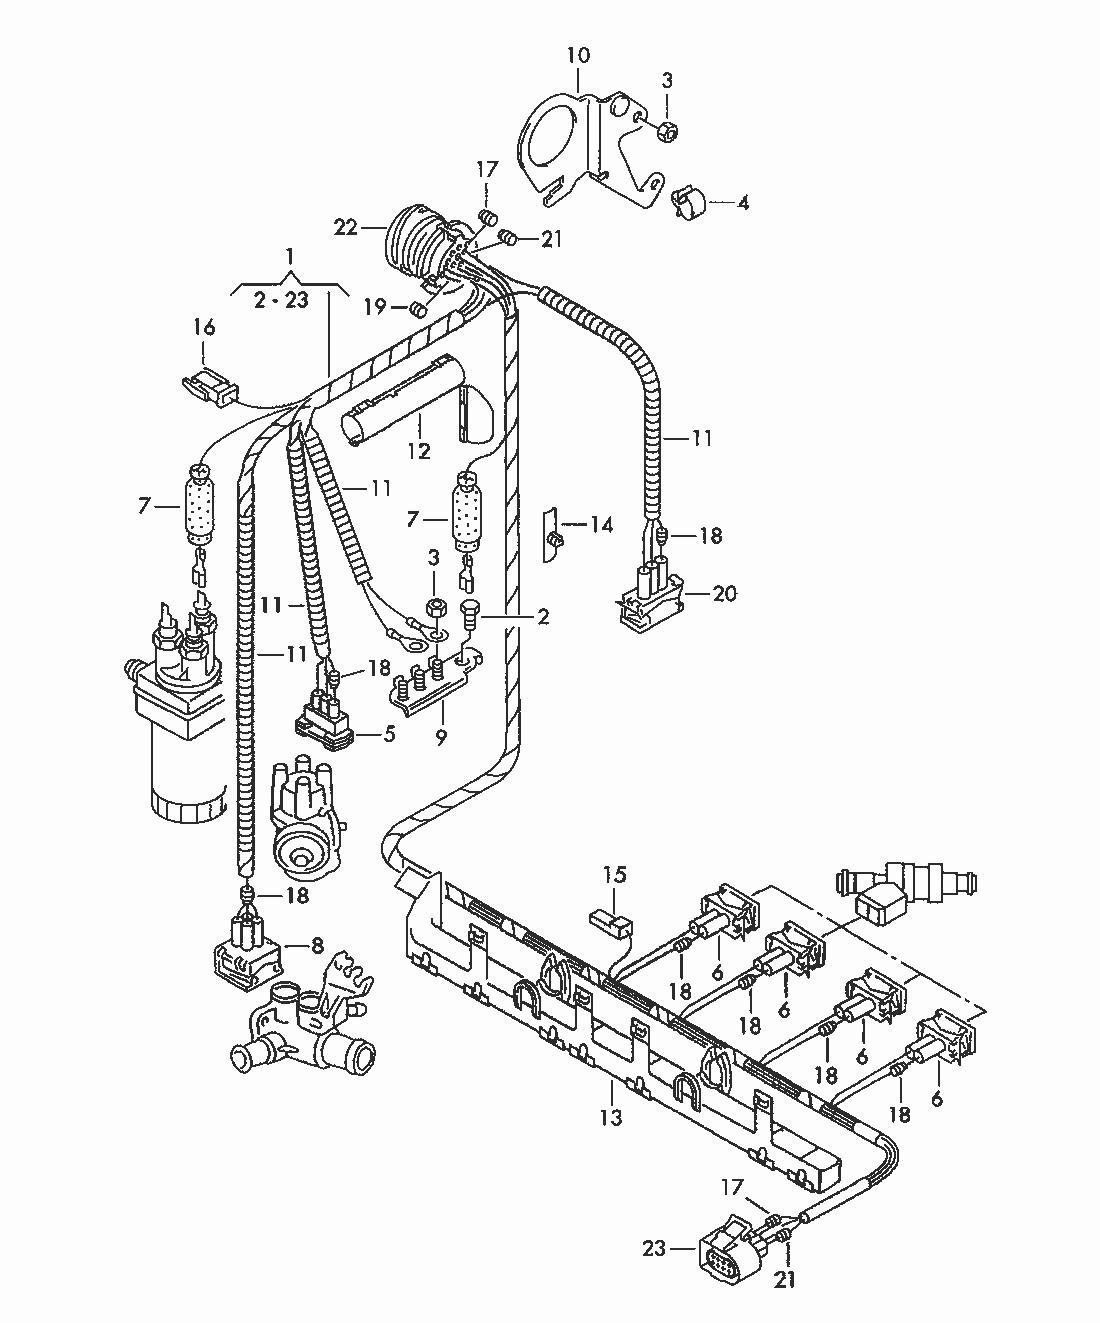 Vr6 Engine Diagram Color Trusted Wiring Diagrams 2000 Jetta Enthusiast U2022 Volkswagen Motor Mount